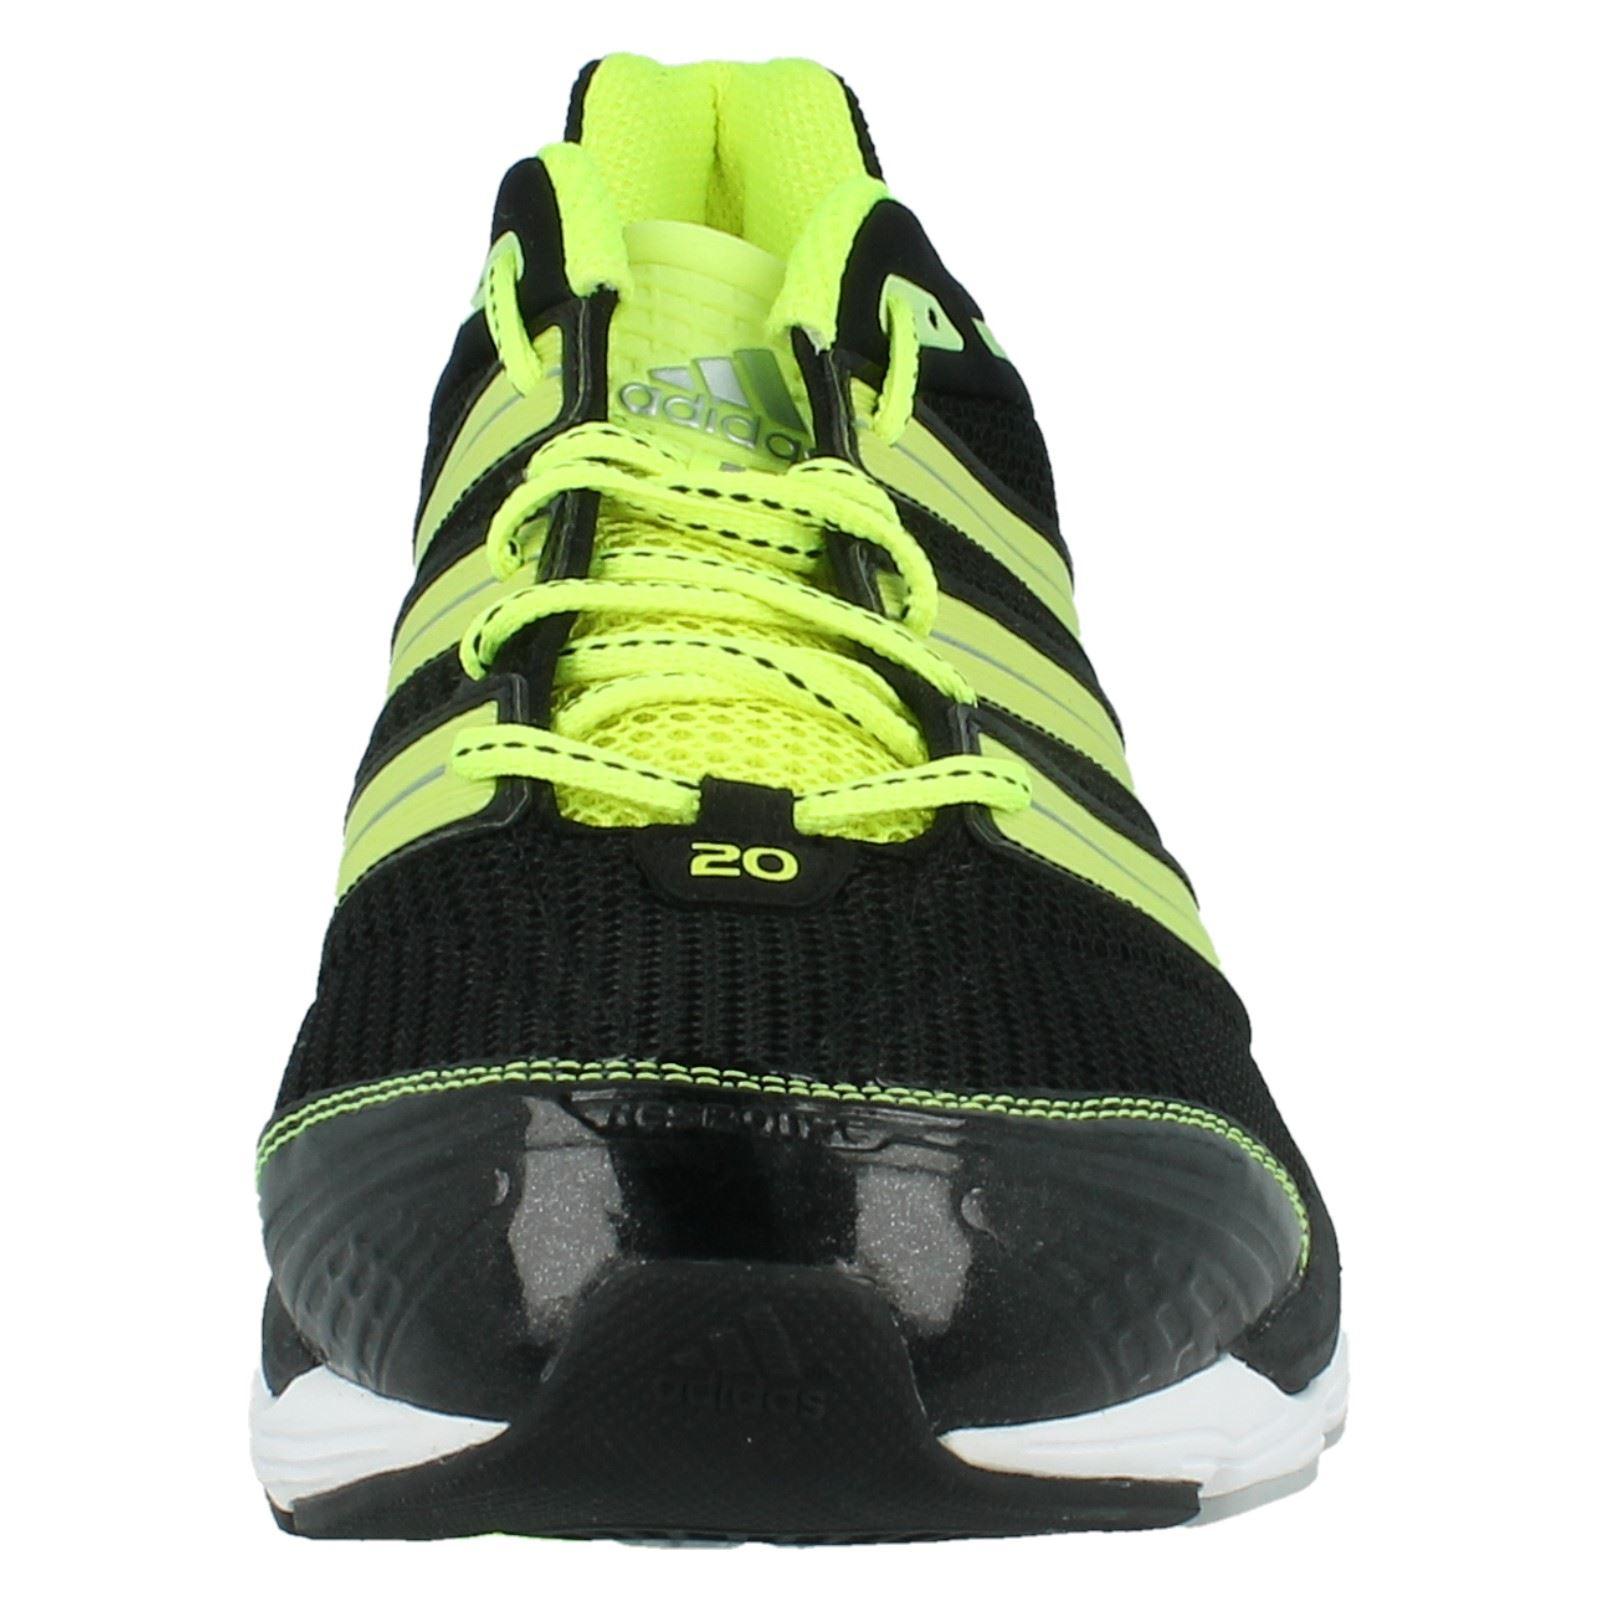 Mens Adidas Cushion Trainers Style - RESP Cushion Adidas 20M c65398